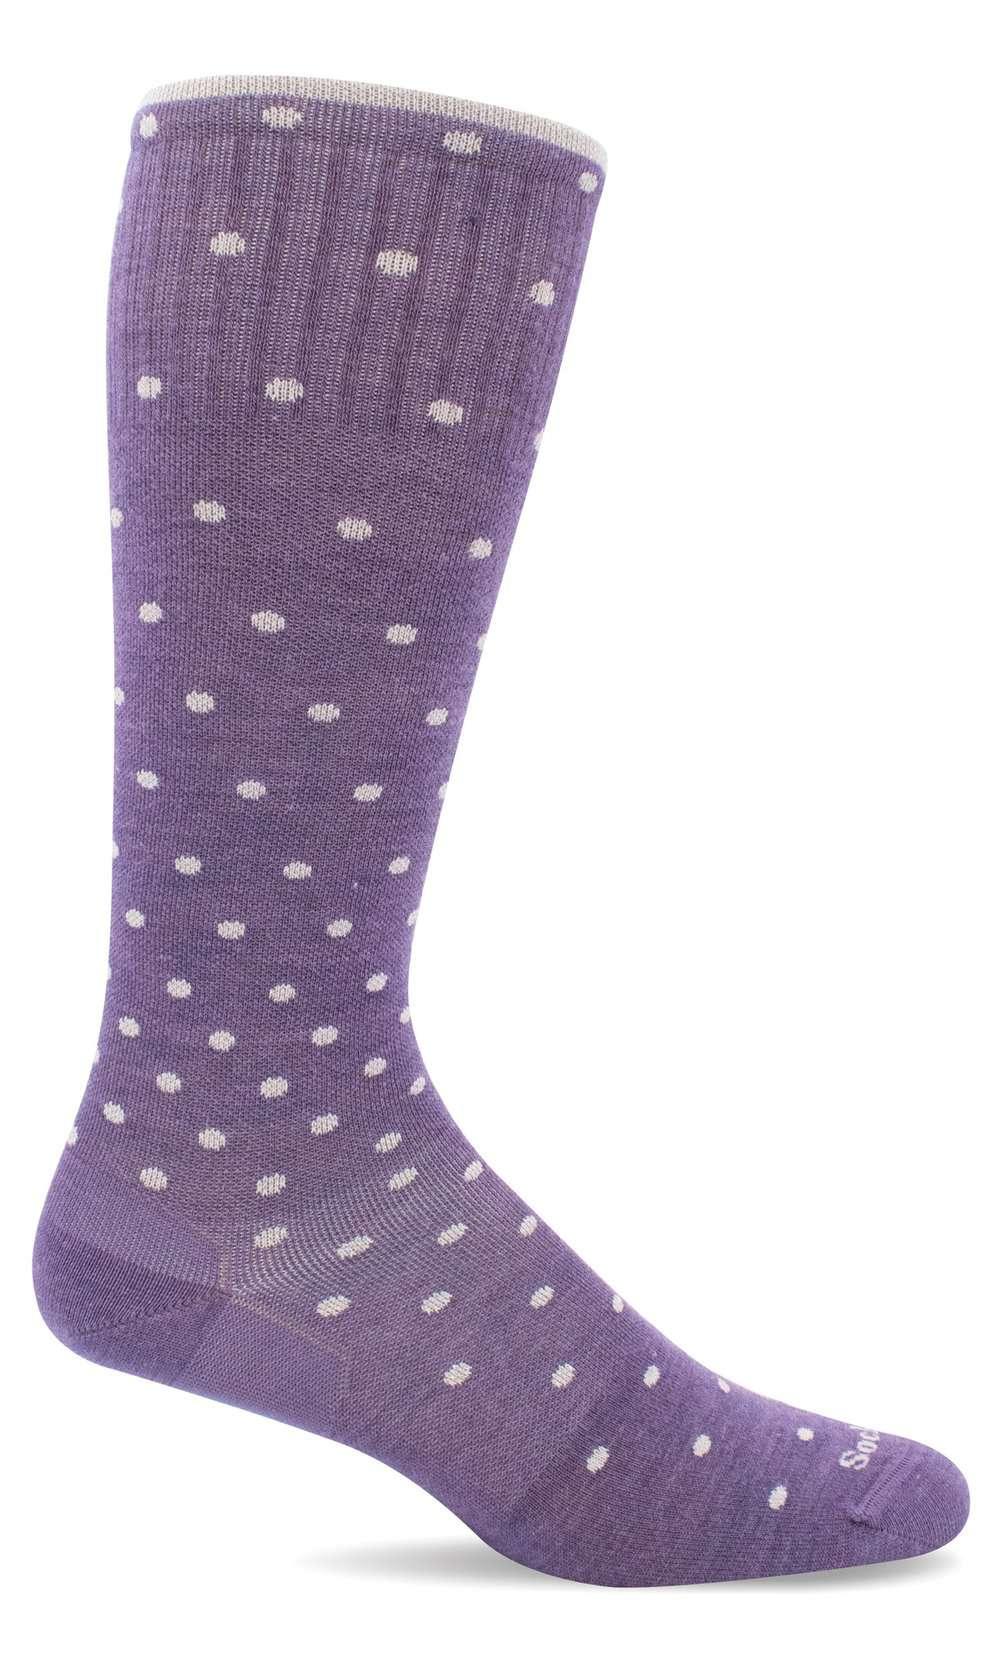 Sockwell On The Spot Graduated Compression Socks